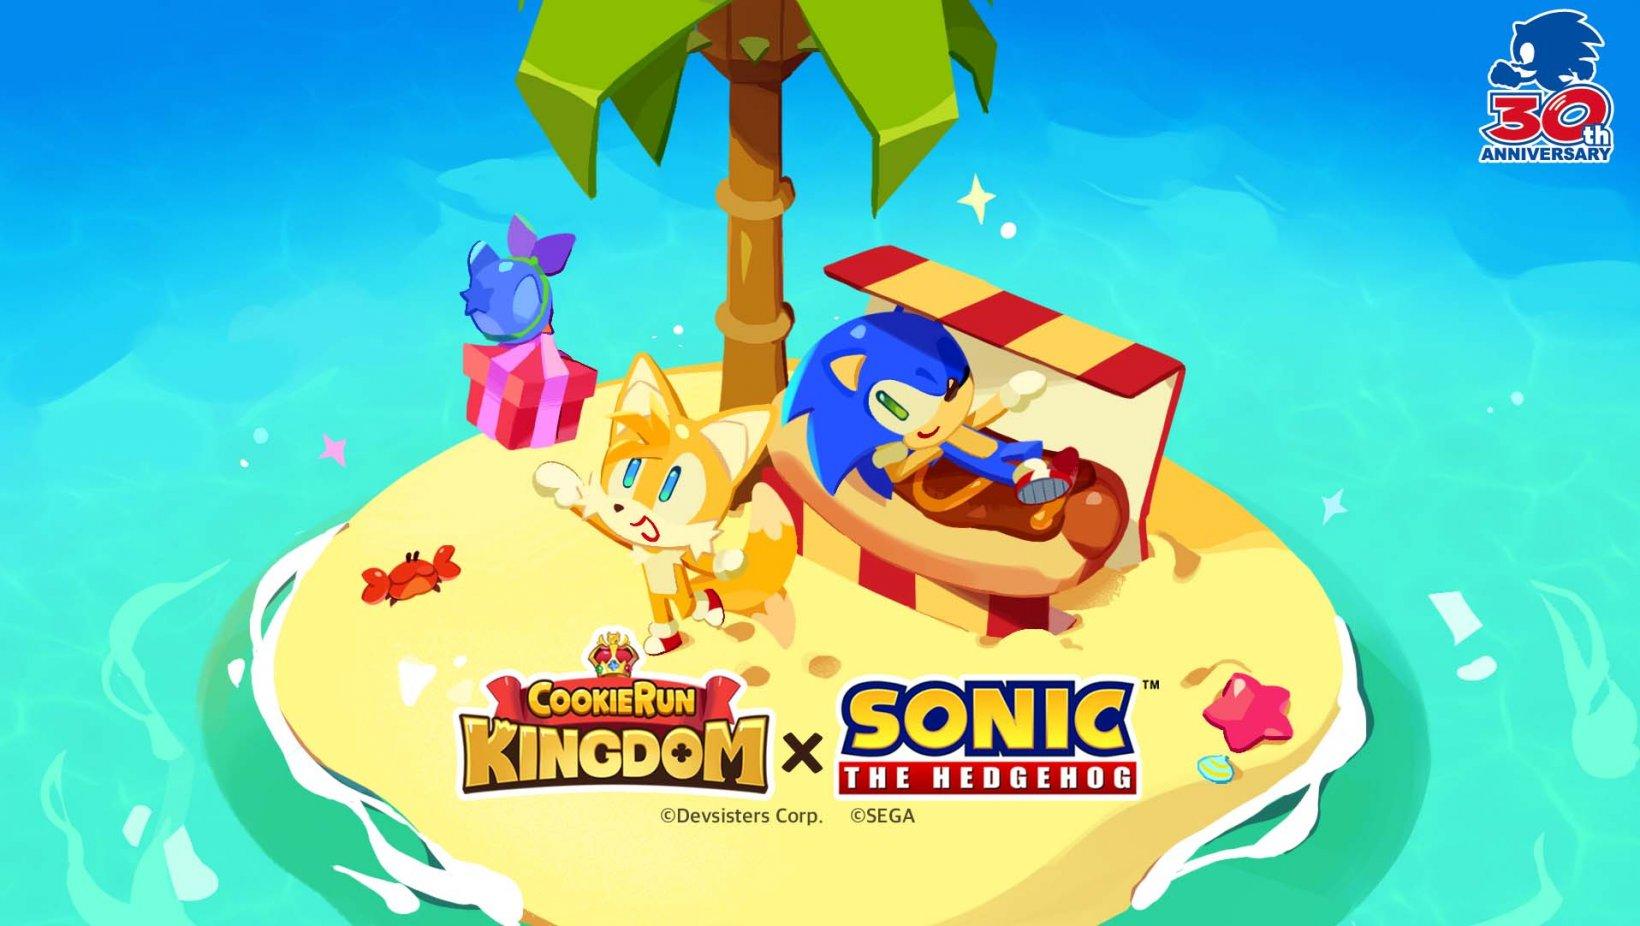 Cookie Run Kingdom Sonic Tails Collab Jpg 1640